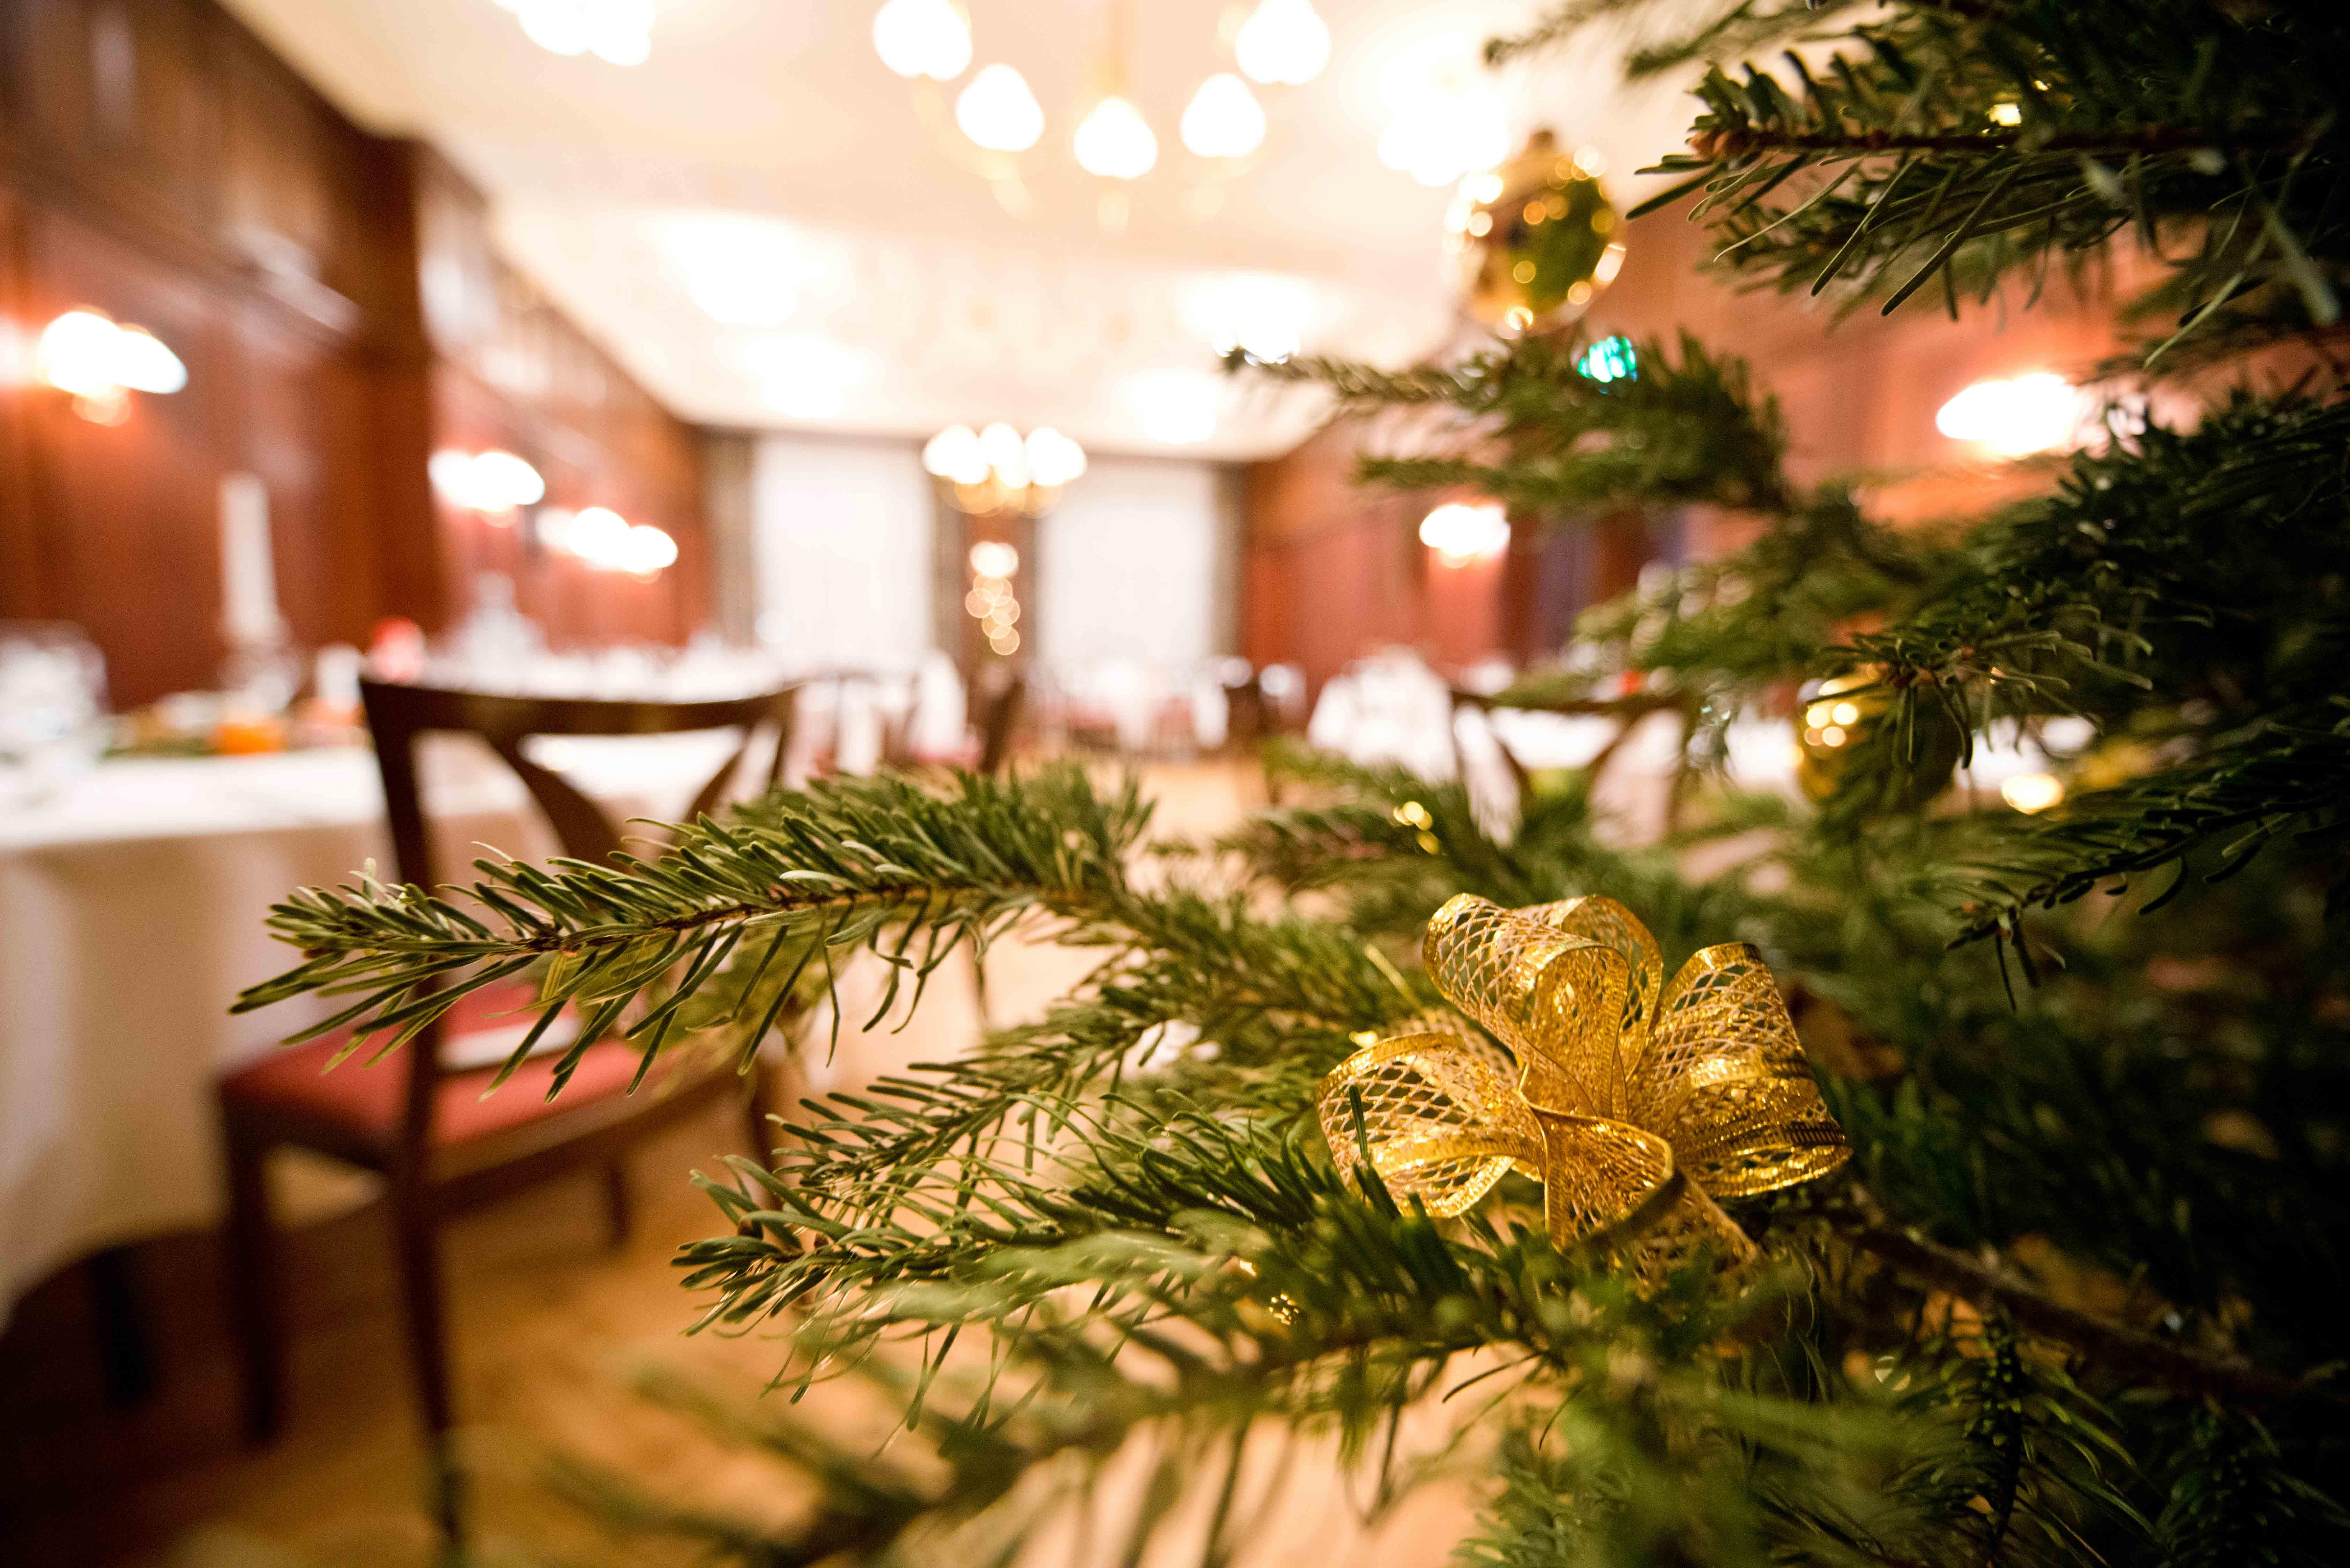 Hotel Albrechtshof Berlin Christmas Party